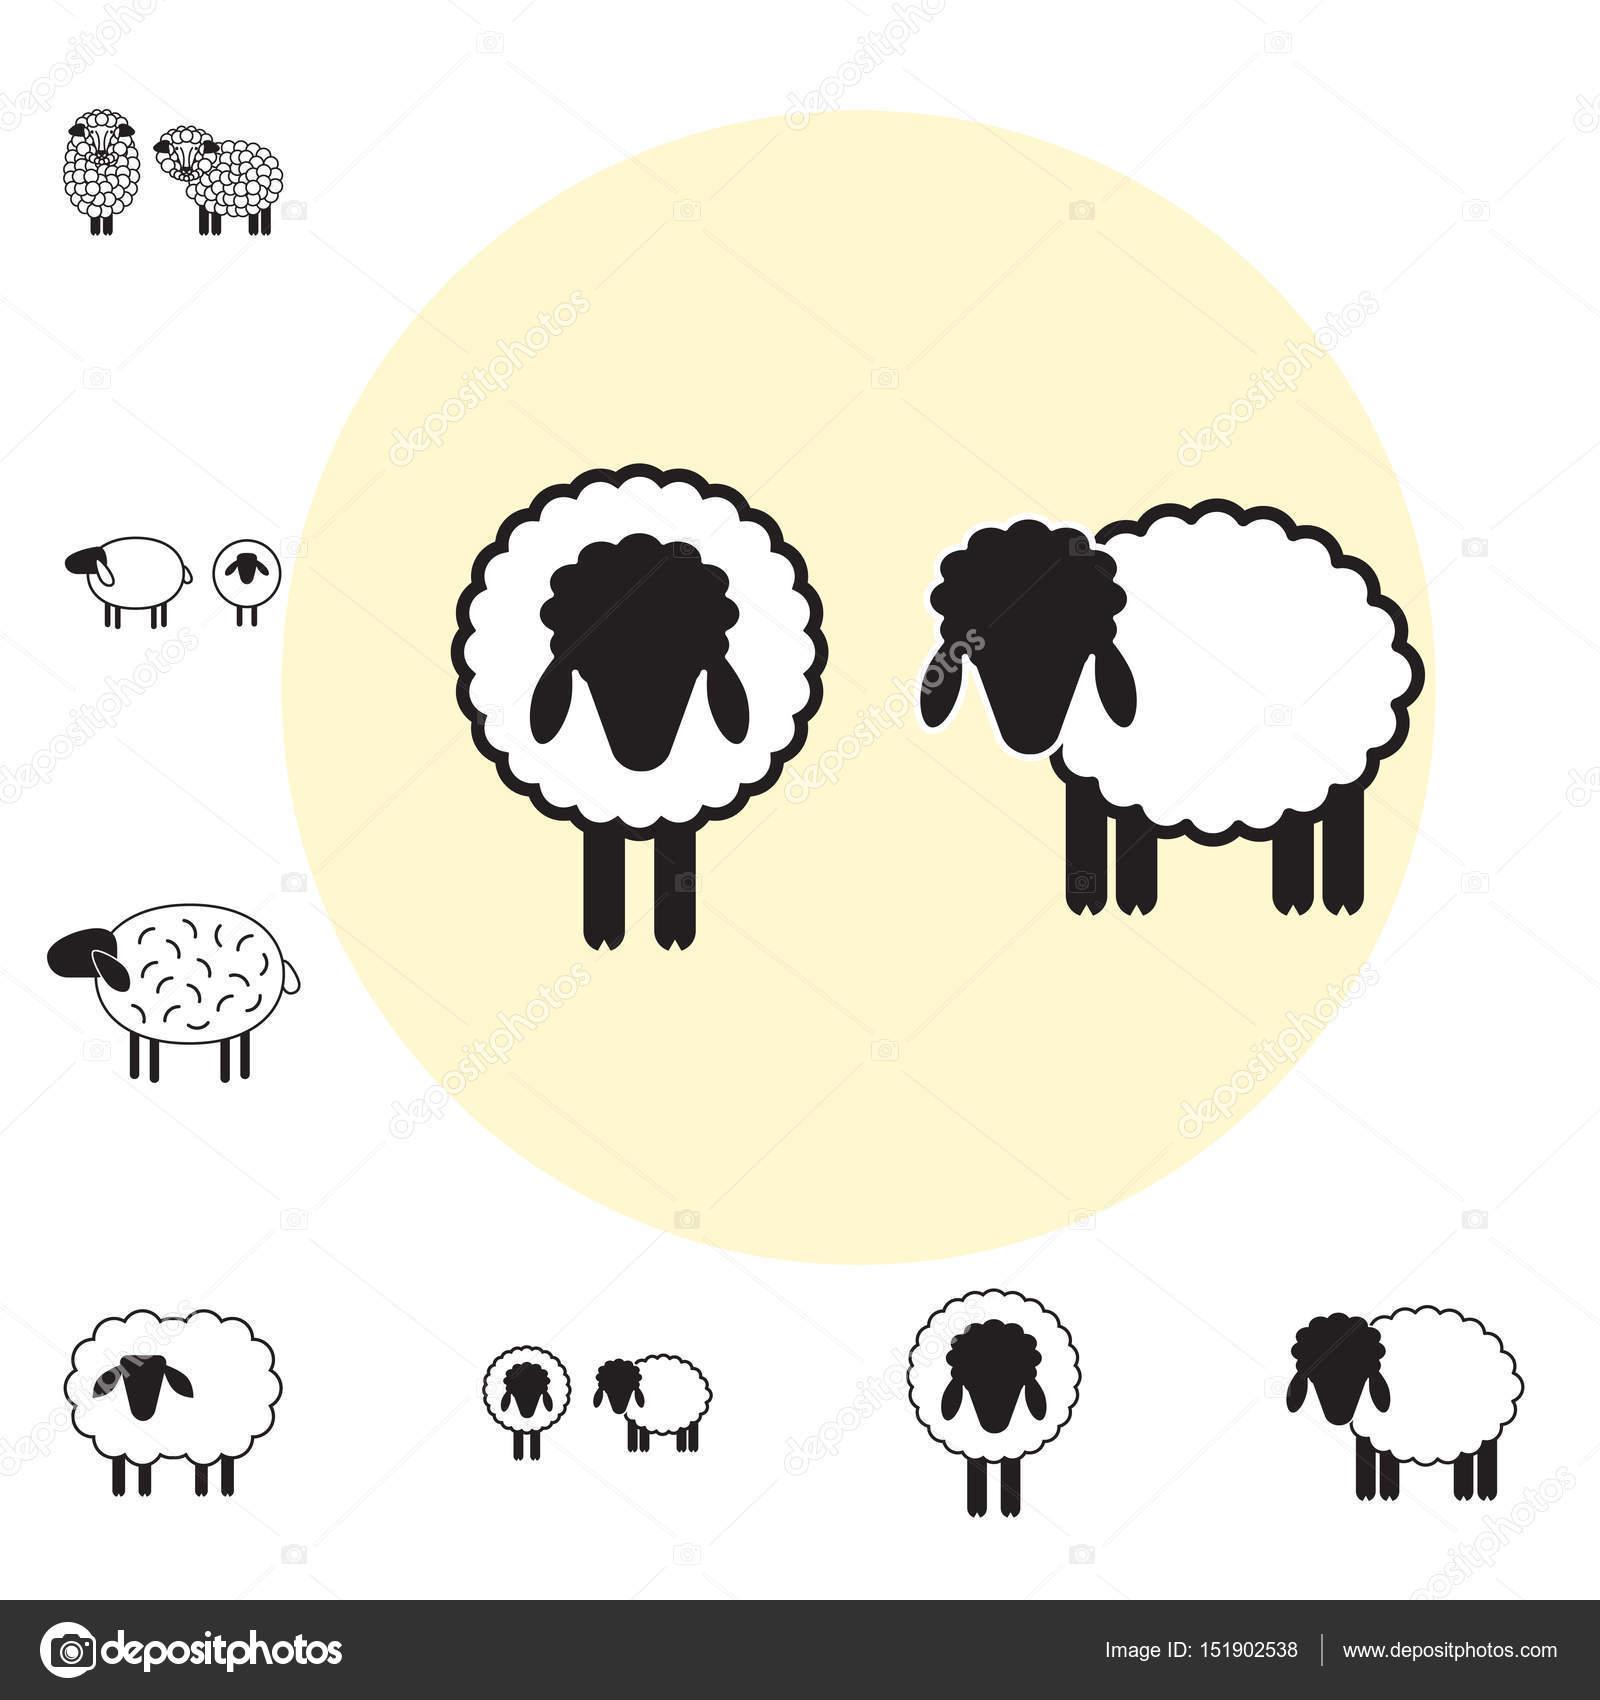 Oveja o carnero icono, Logo, plantilla, pictograma — Archivo ...